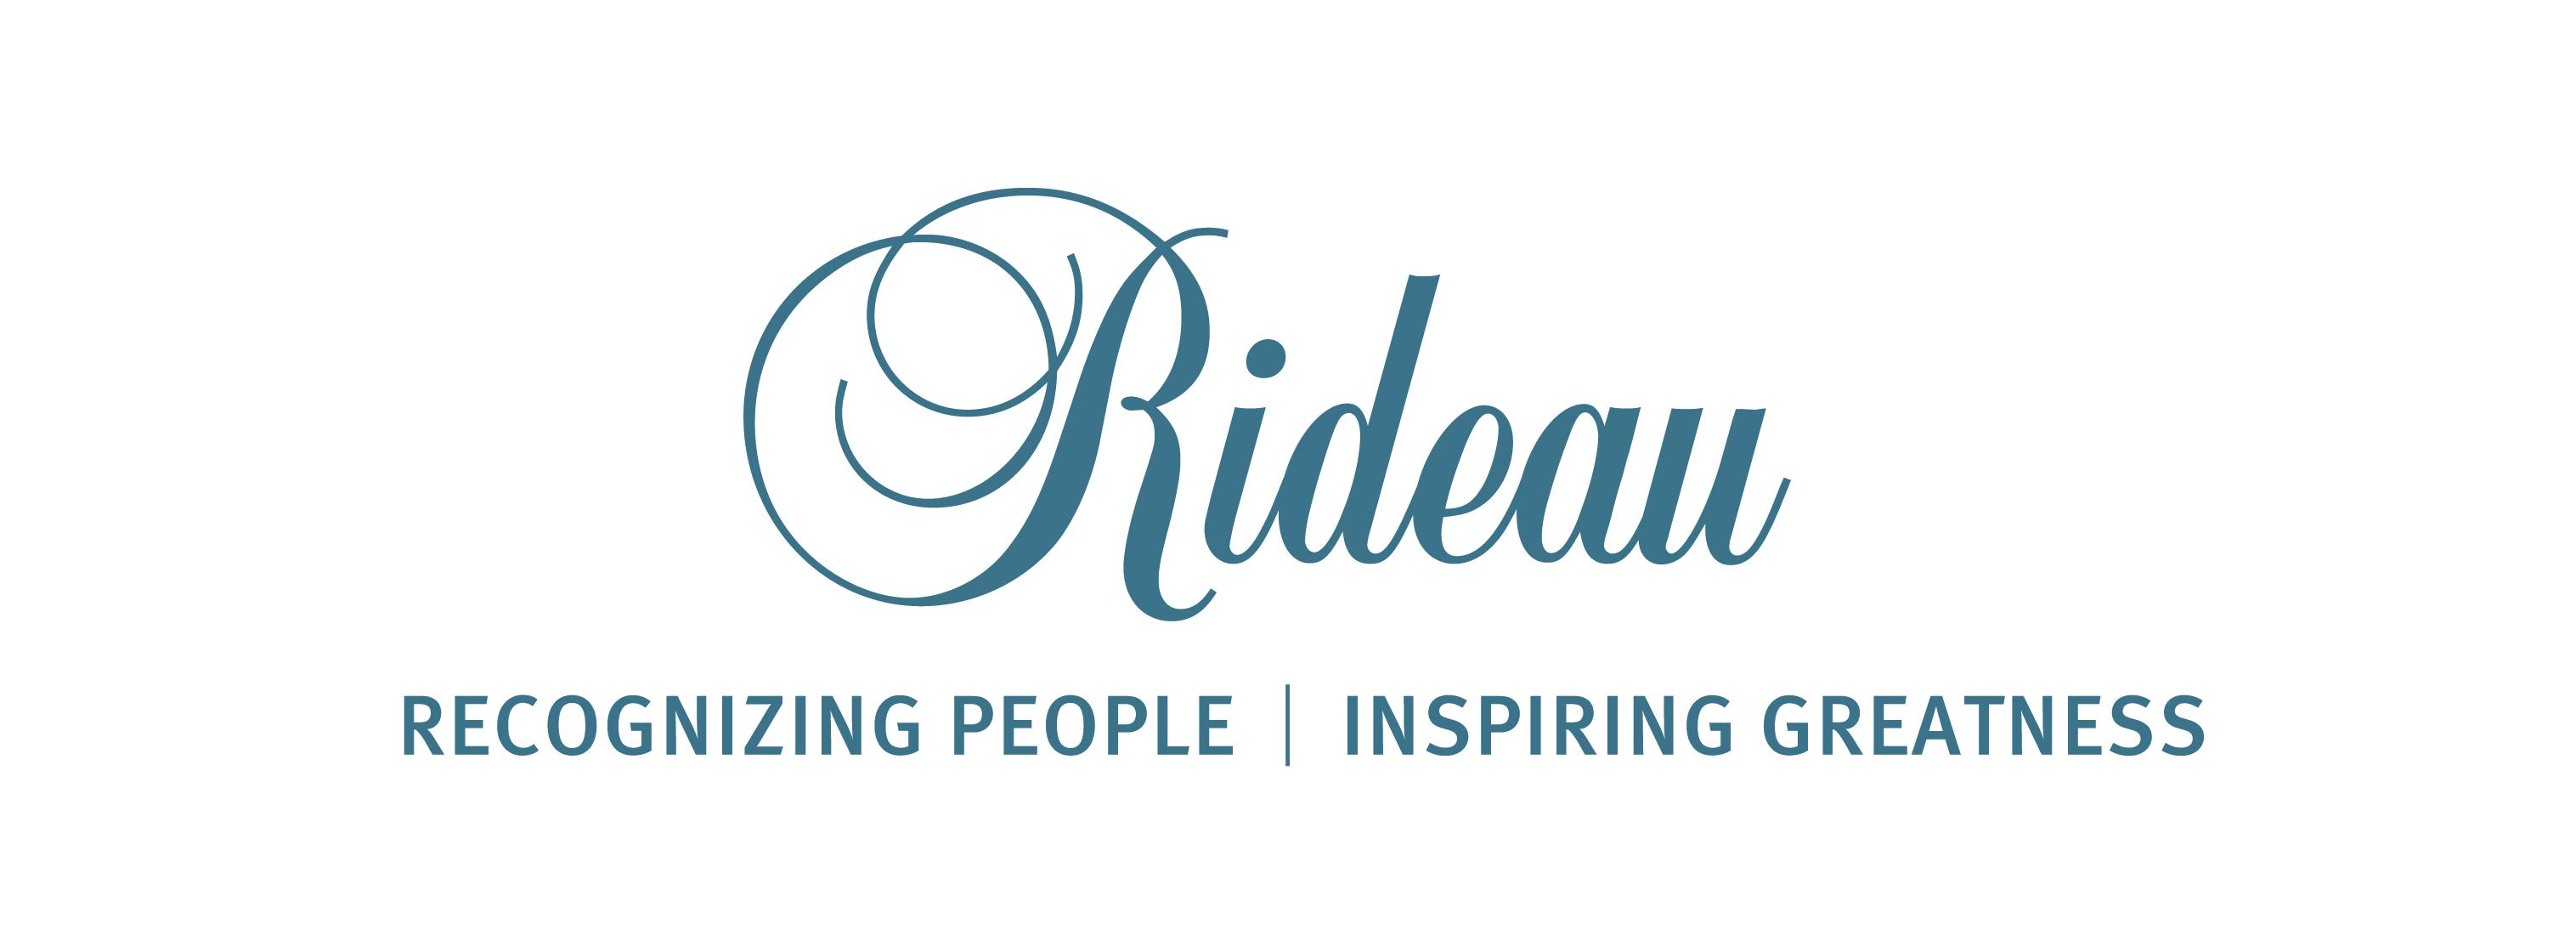 Jean Francois Grou Joins Rideau Board Of Directors